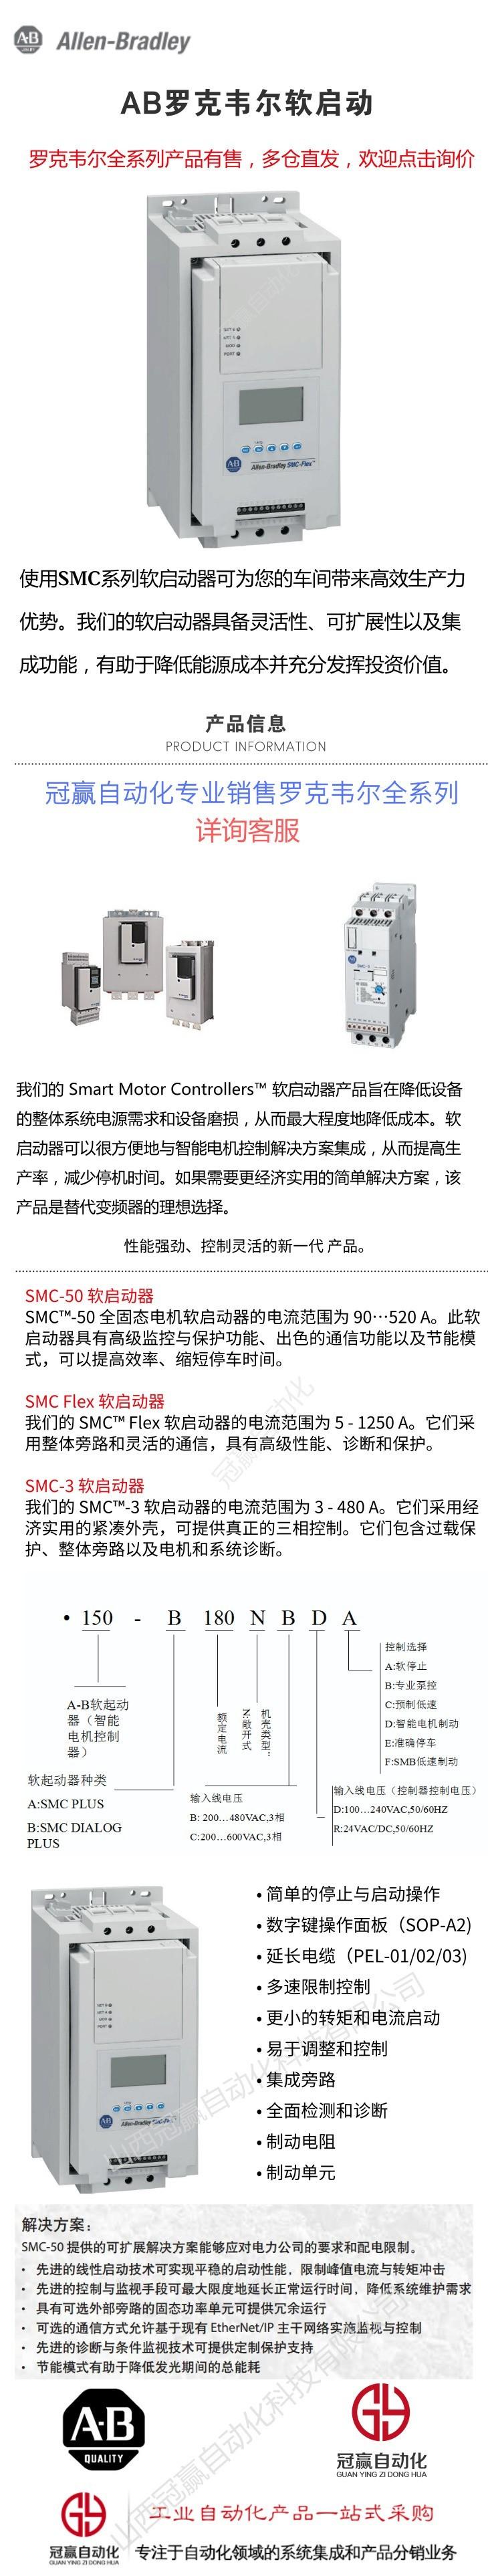 SMC-3 低压软启动器